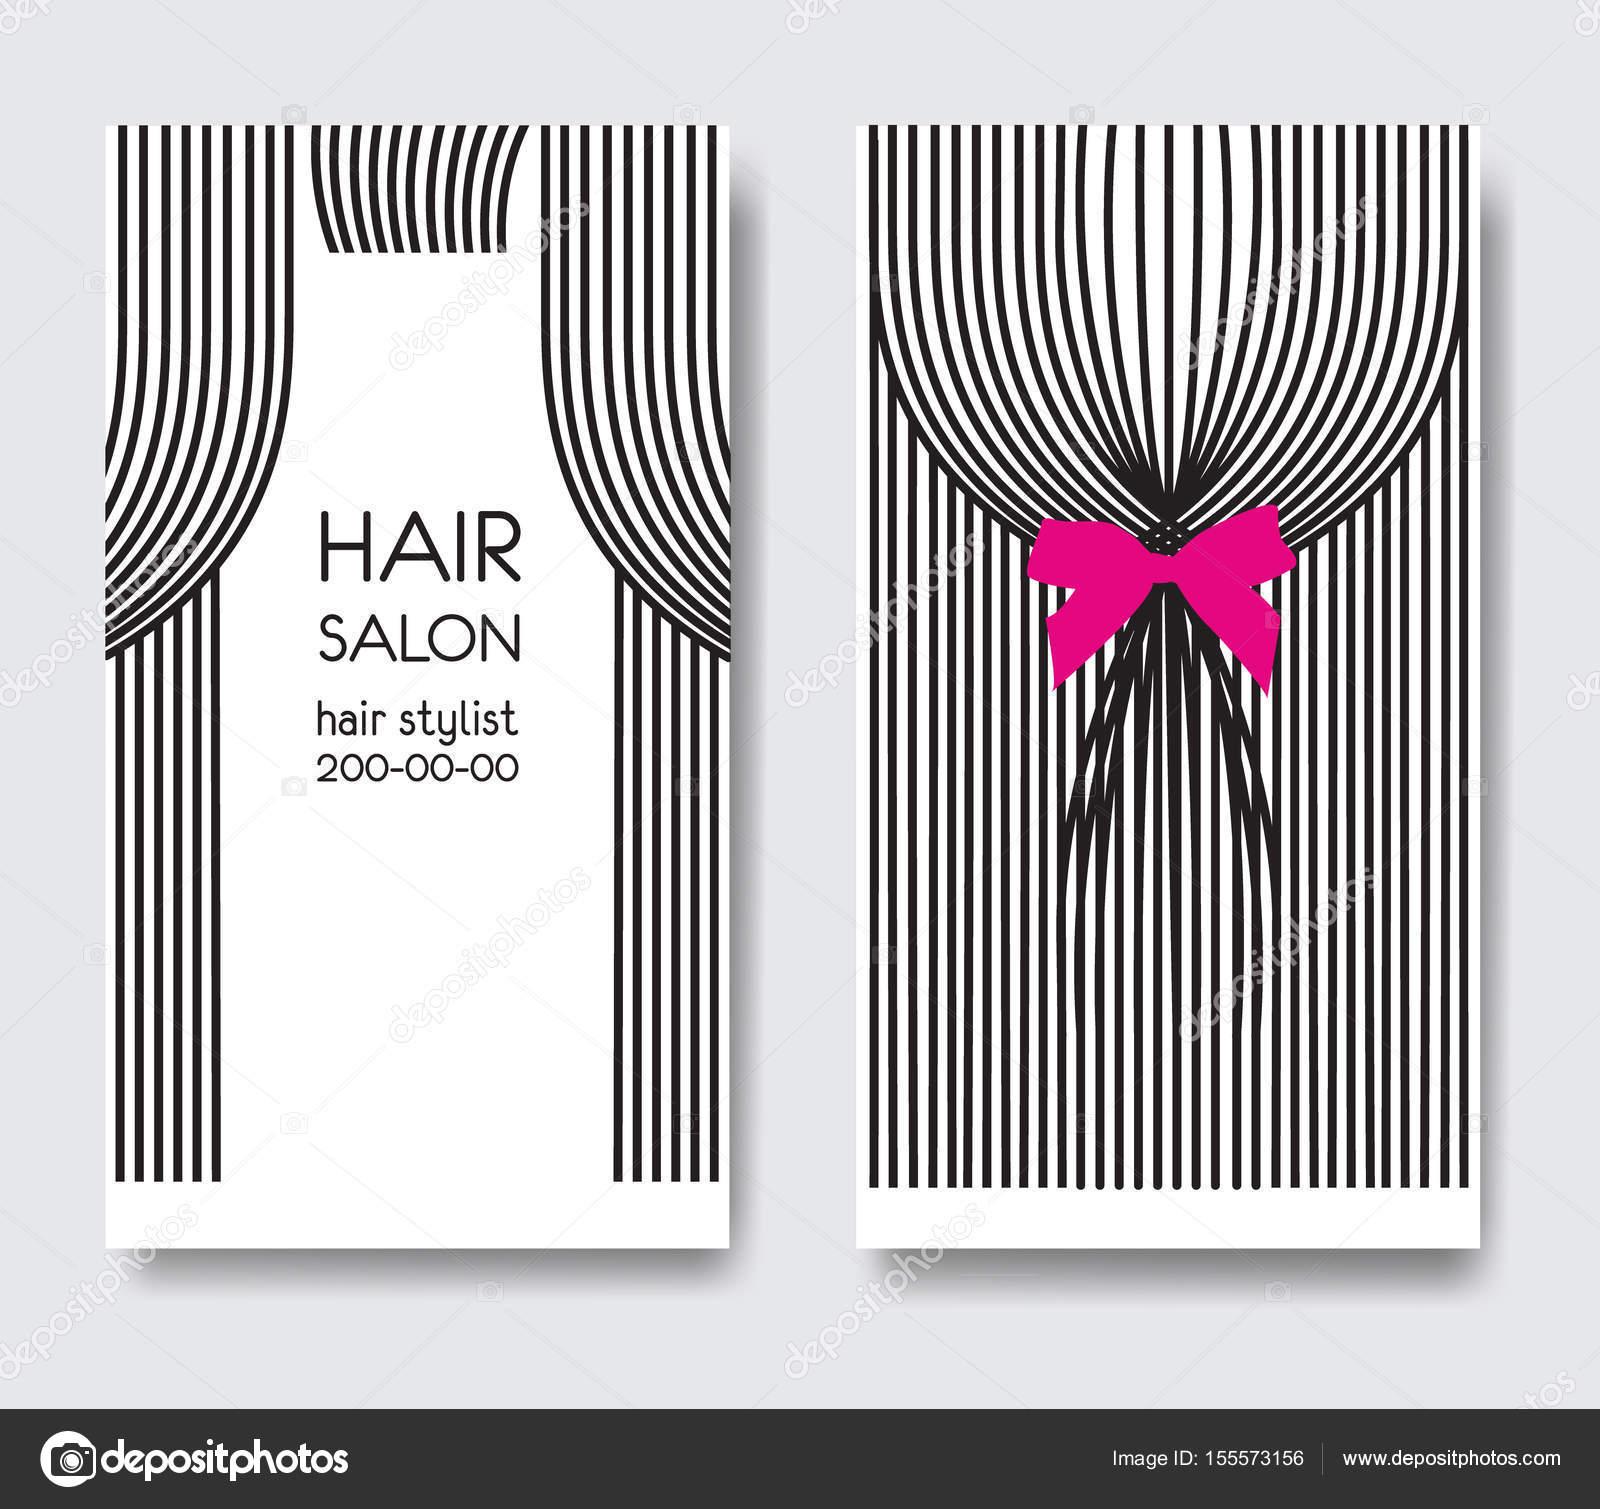 Template design business card long straight hair bow business card template design business card long straight hair bow business card stock vector colourmoves